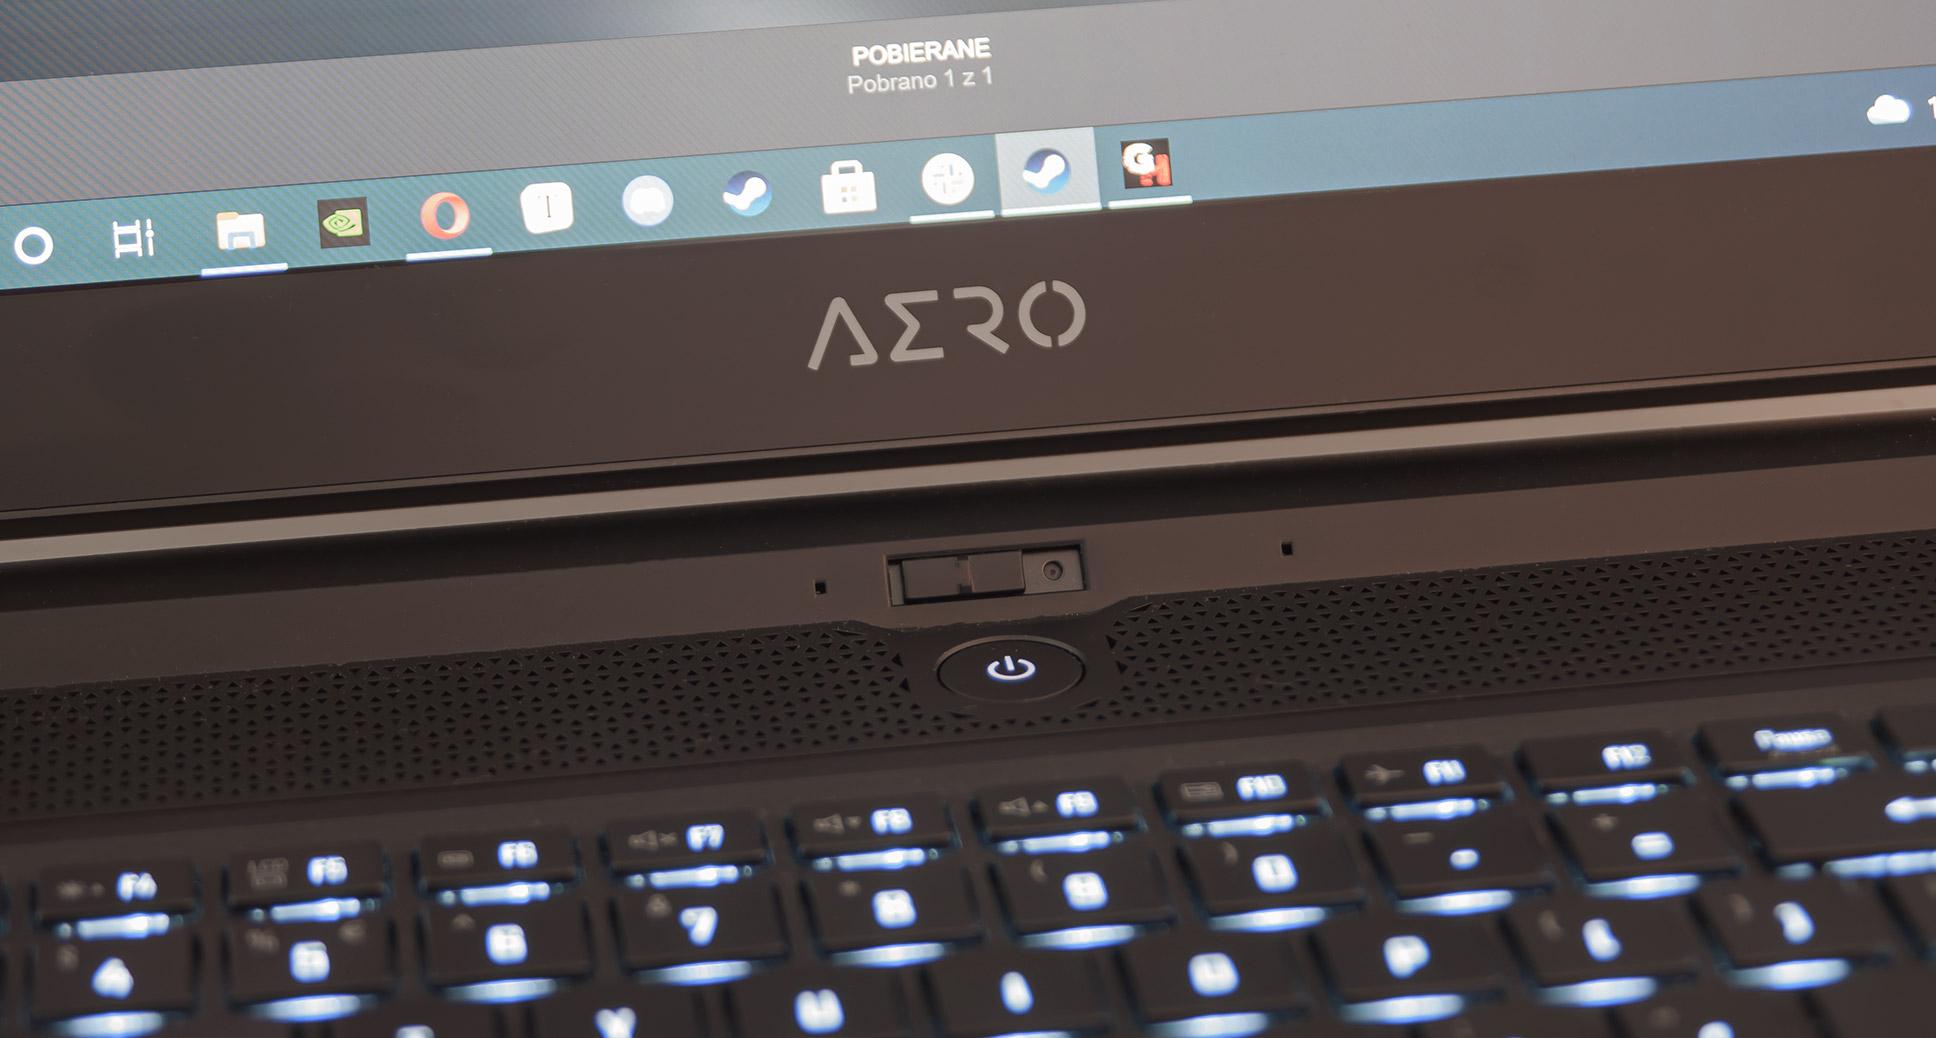 Gigabyte AERO 17 HDR Recenzja Tabletowo